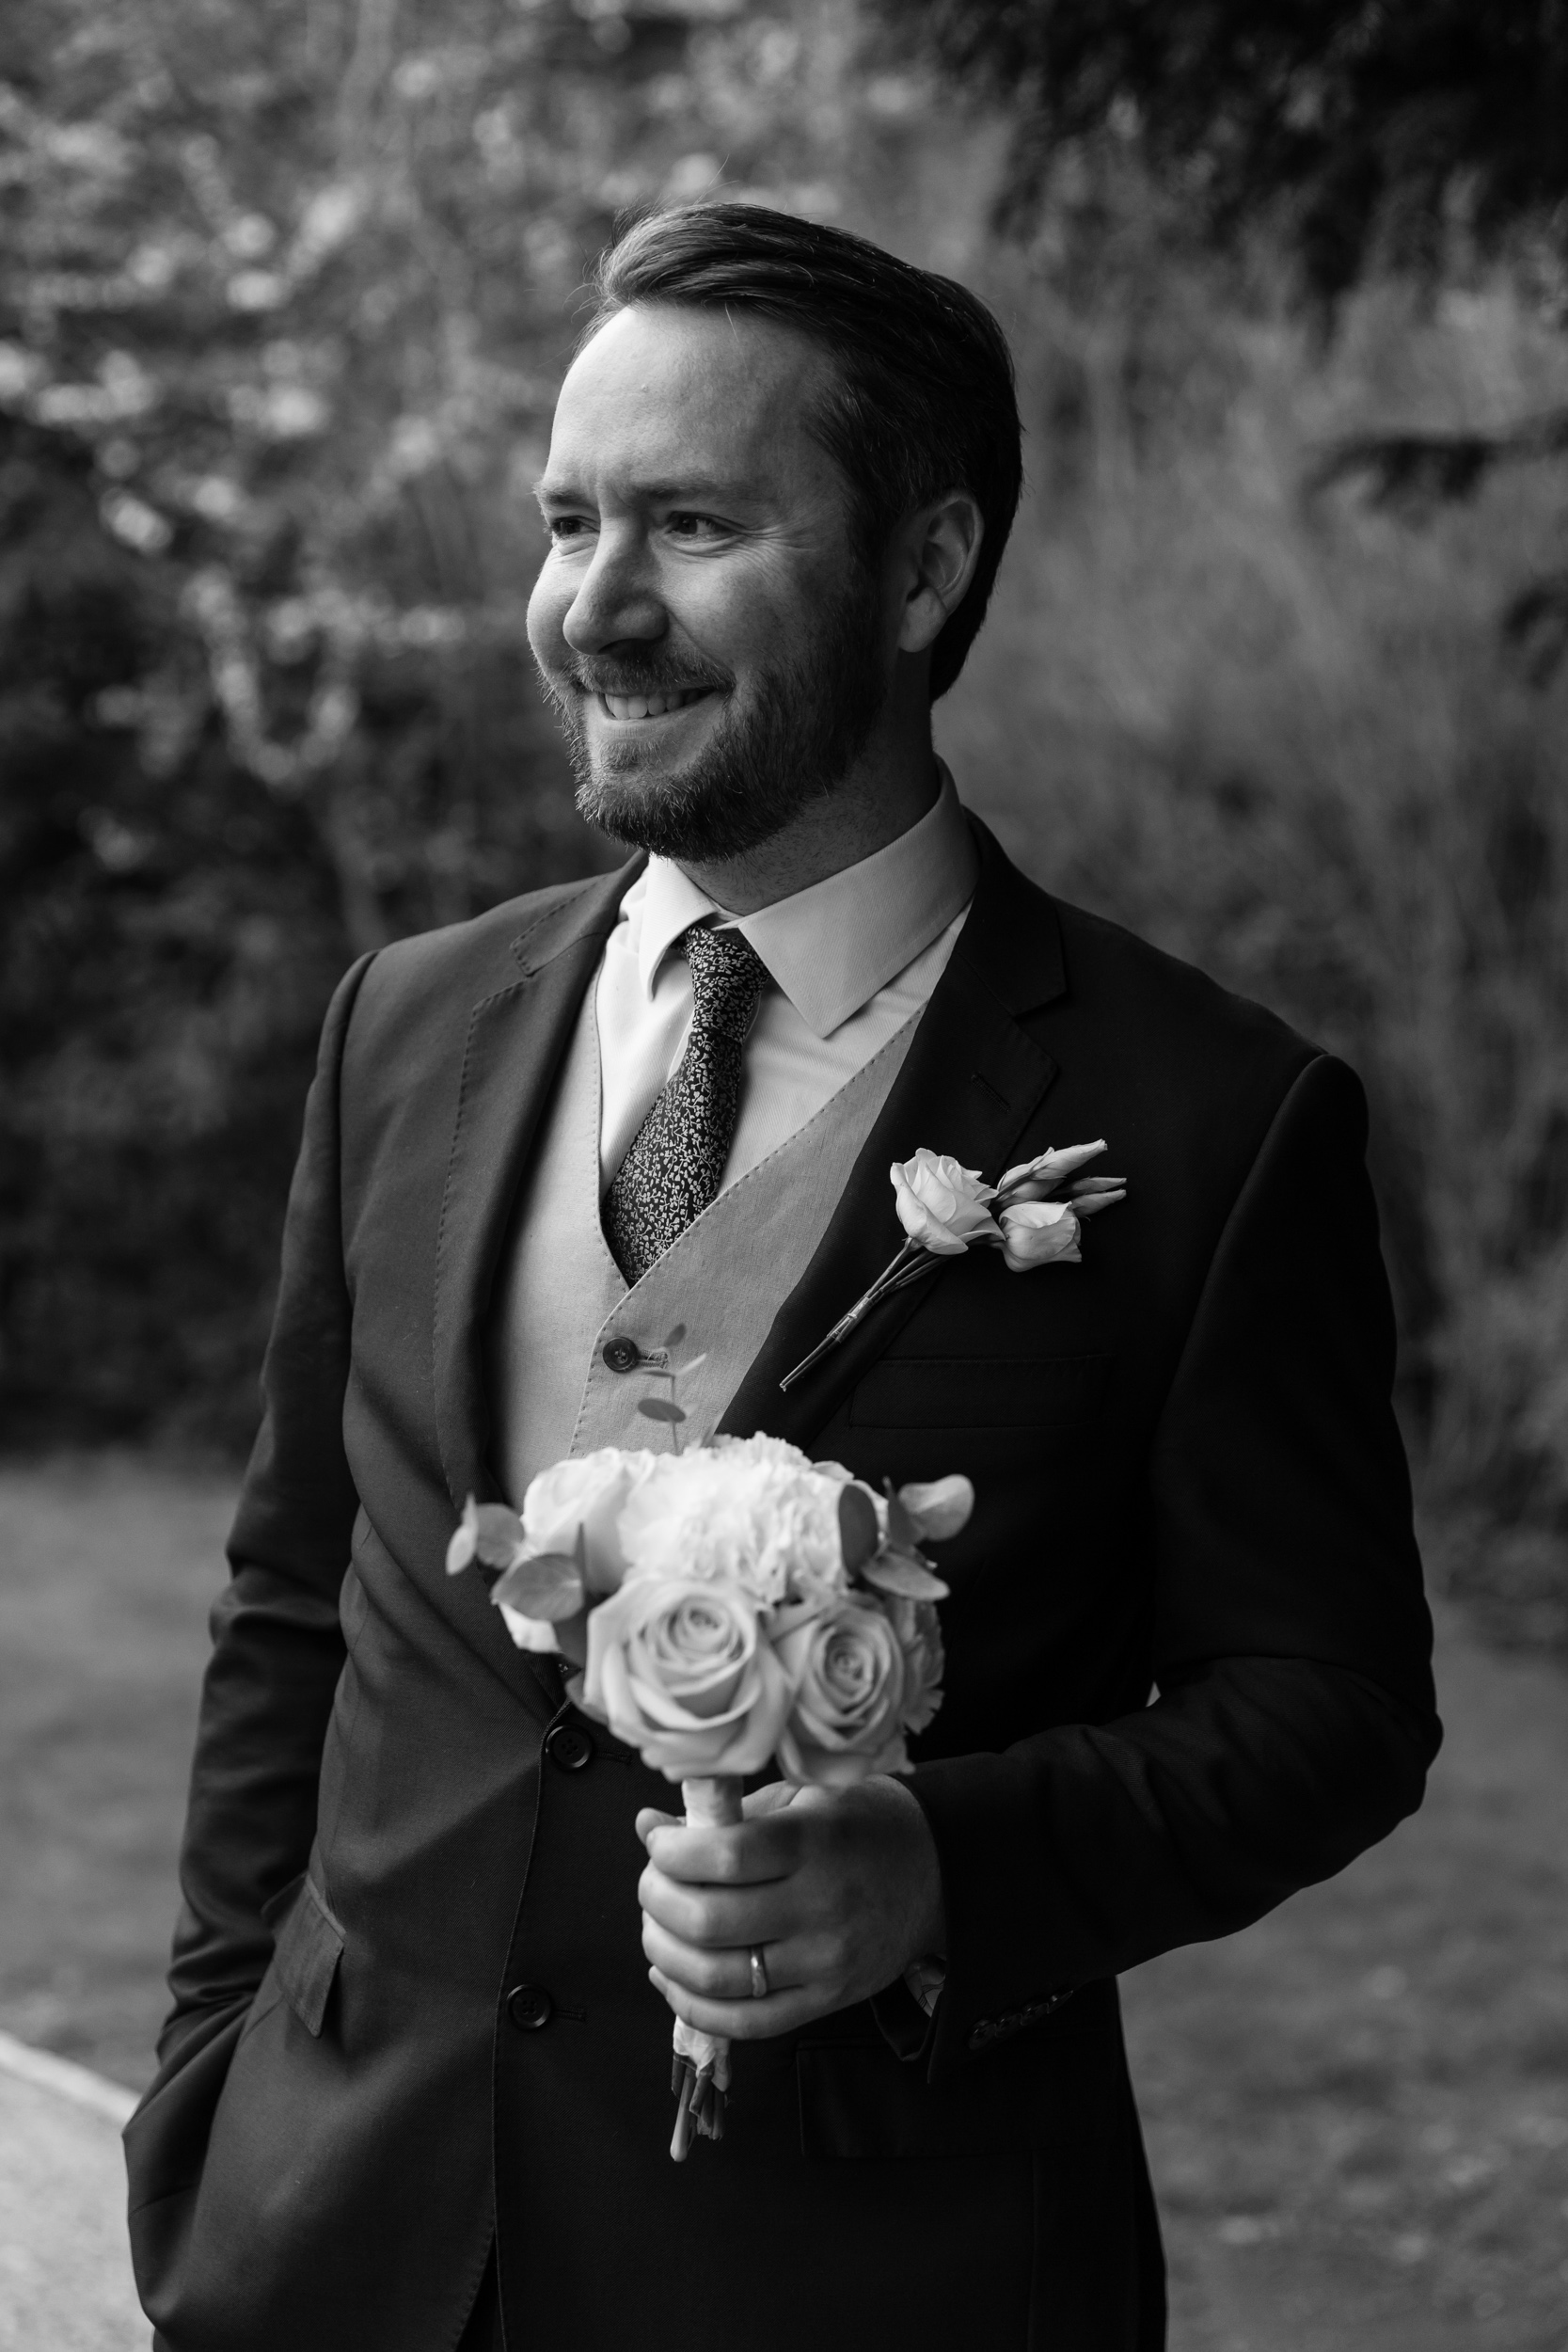 Richmond-upon-Thames Wedding Photographer